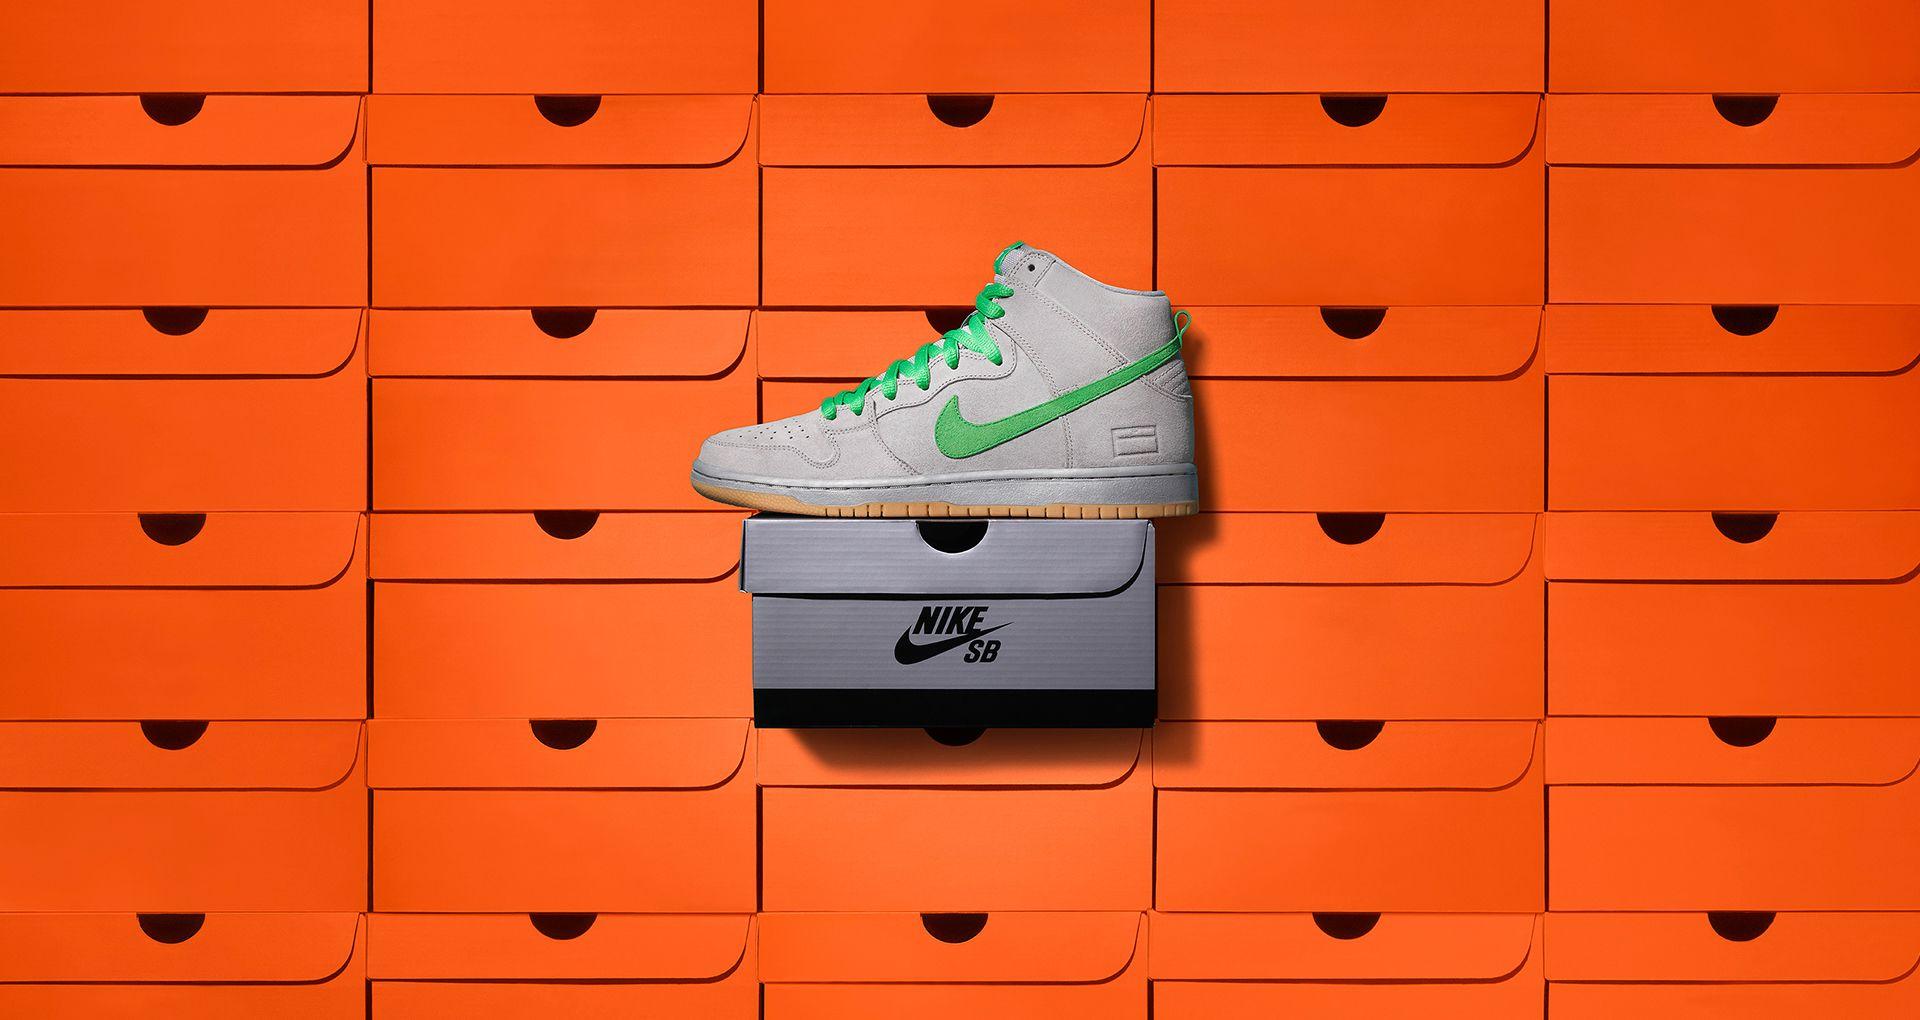 hot sale online 7e7fc d3b40 Dunk High SB Gray Box Release Date. Nike+ SNKRS